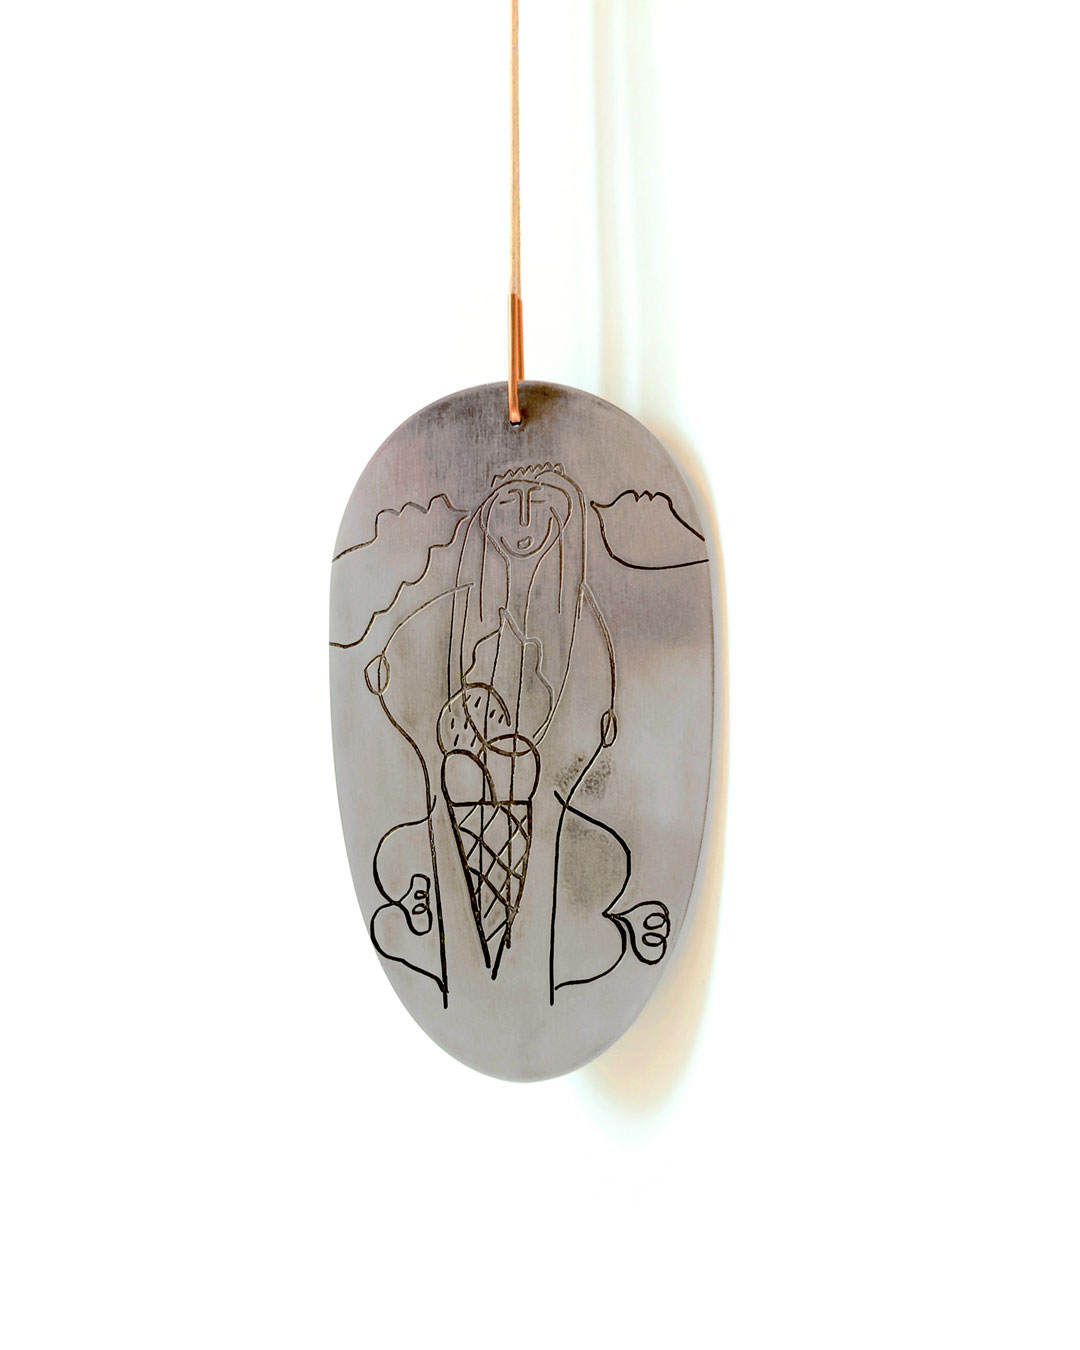 Julia Walter, Mother of Ice Cream, 2017, pendant; aluminium, copper, cotton string, 125 x 230 x 4 mm, €1750